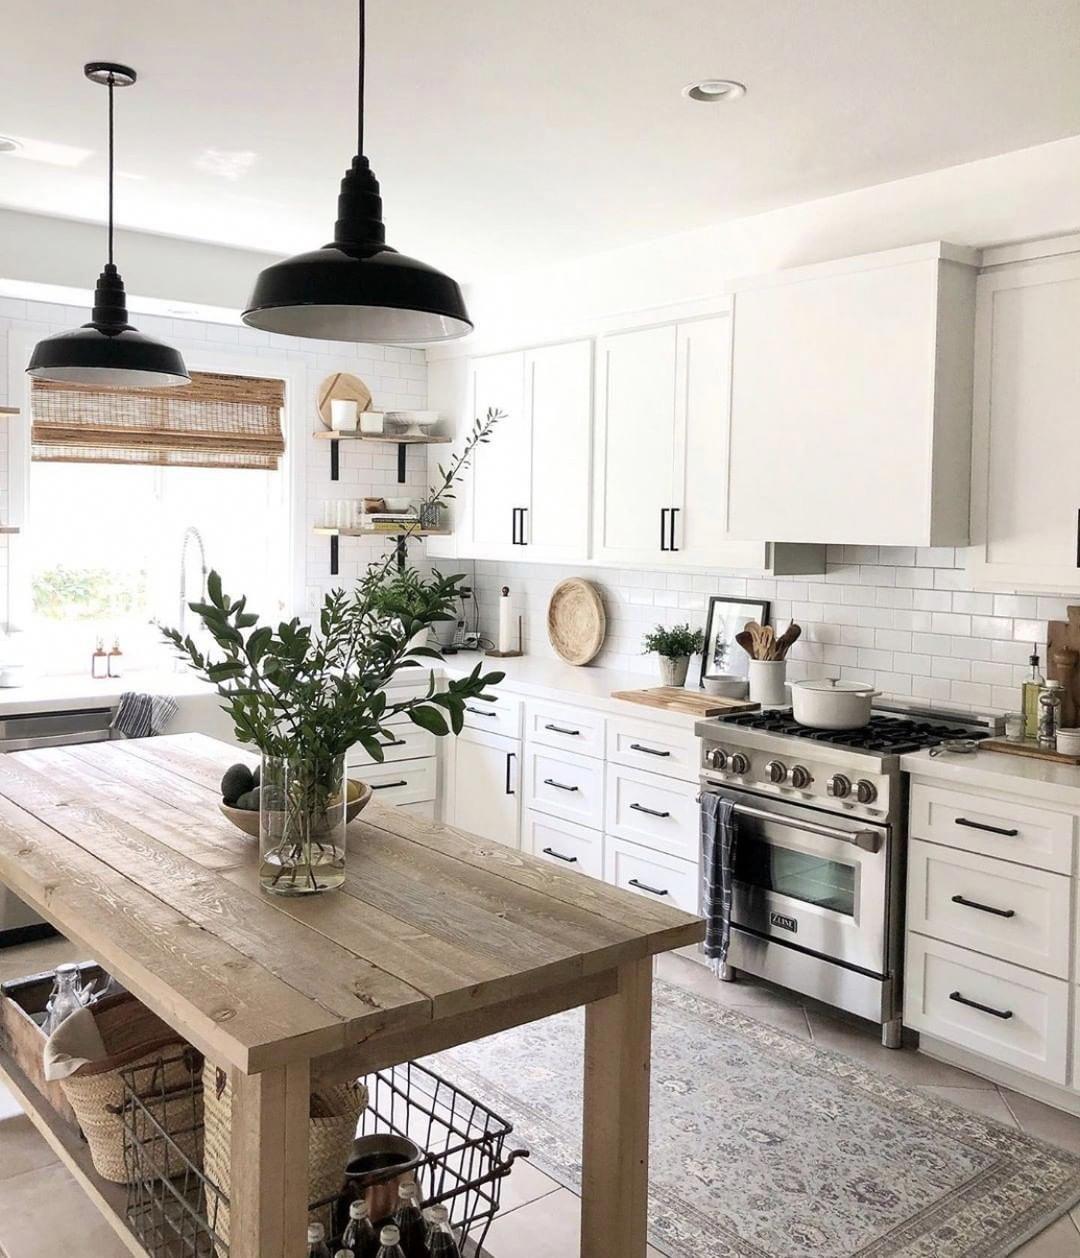 Tuscanhouse Rustic Modern Kitchen Rustic Kitchen Home Decor Kitchen